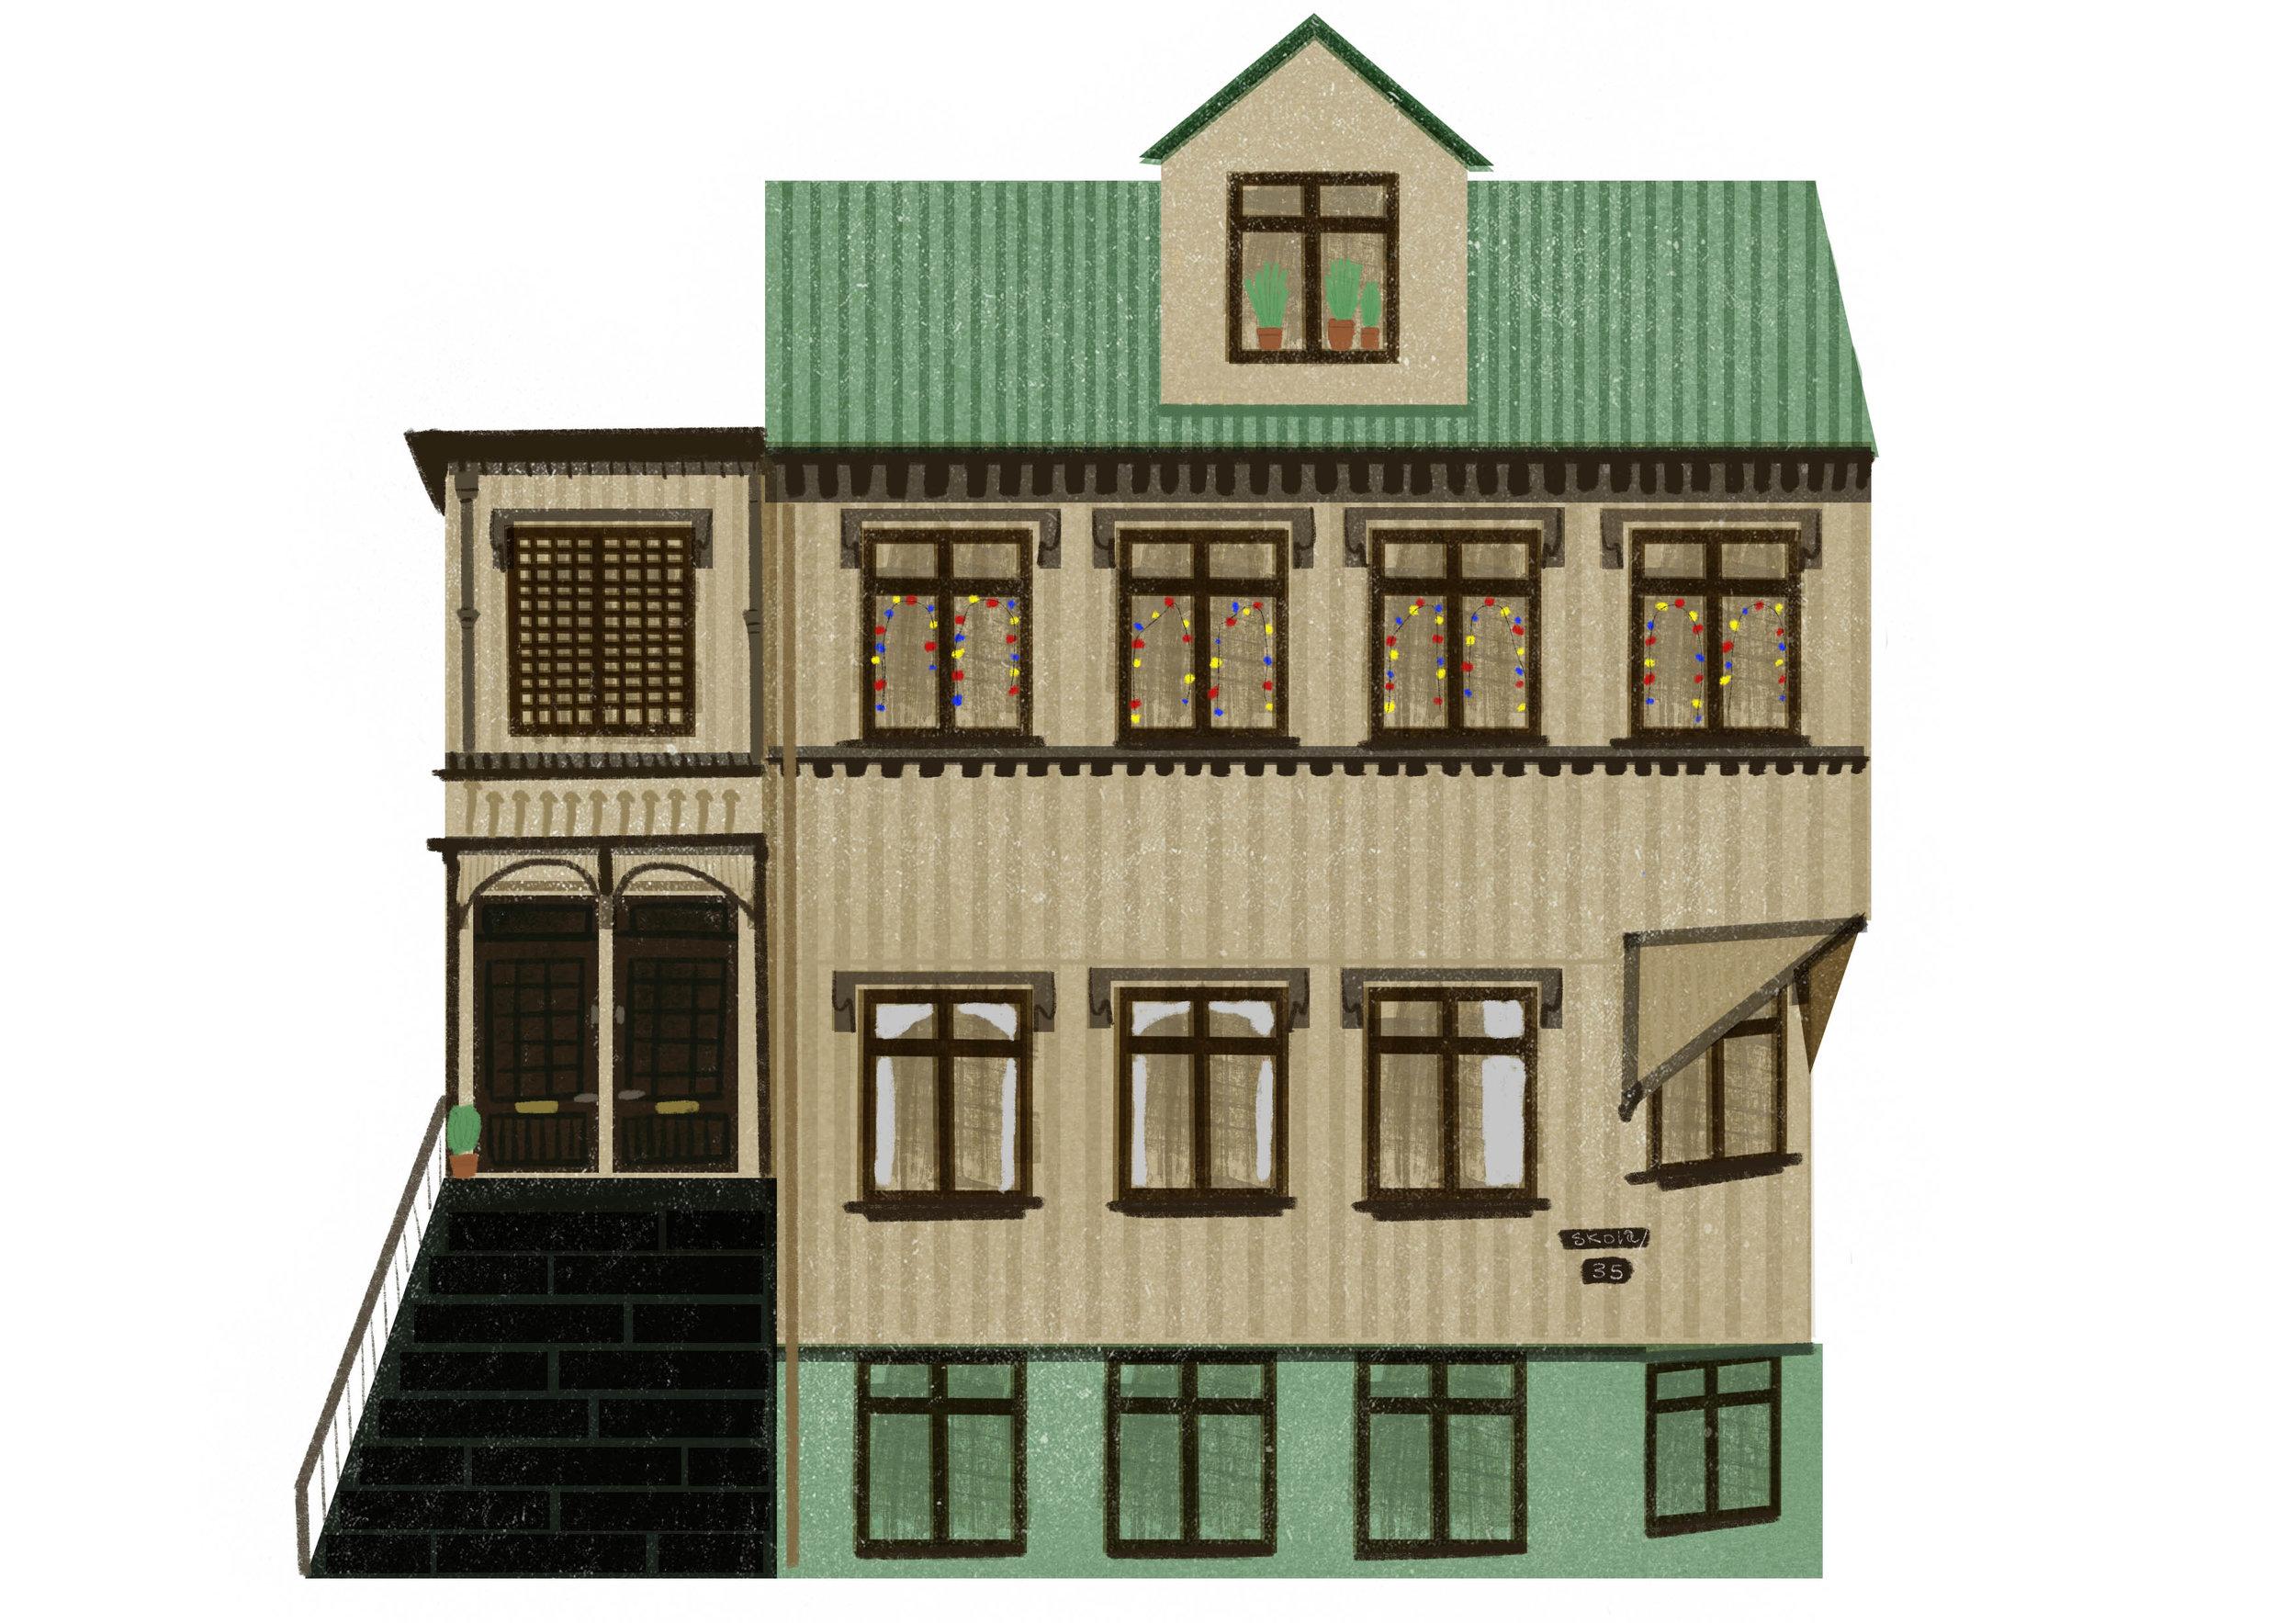 iceclandic_house_flat.jpg